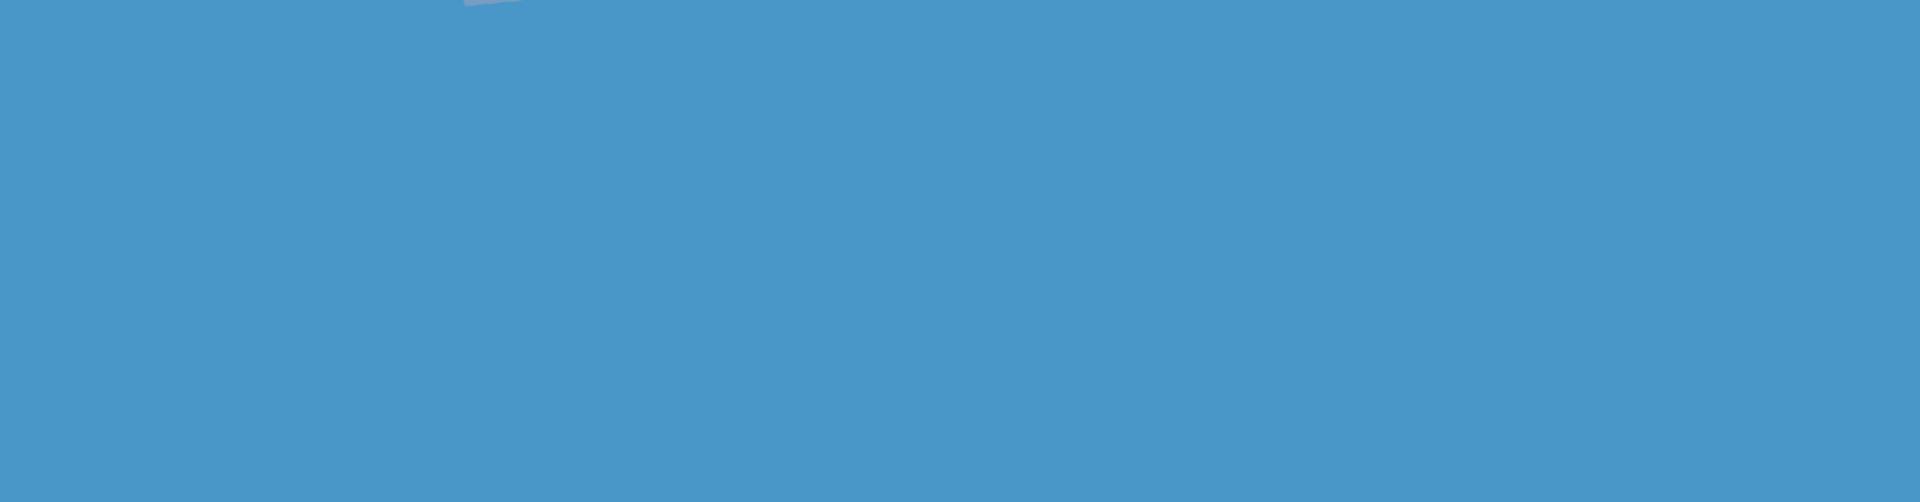 fondo-azul2